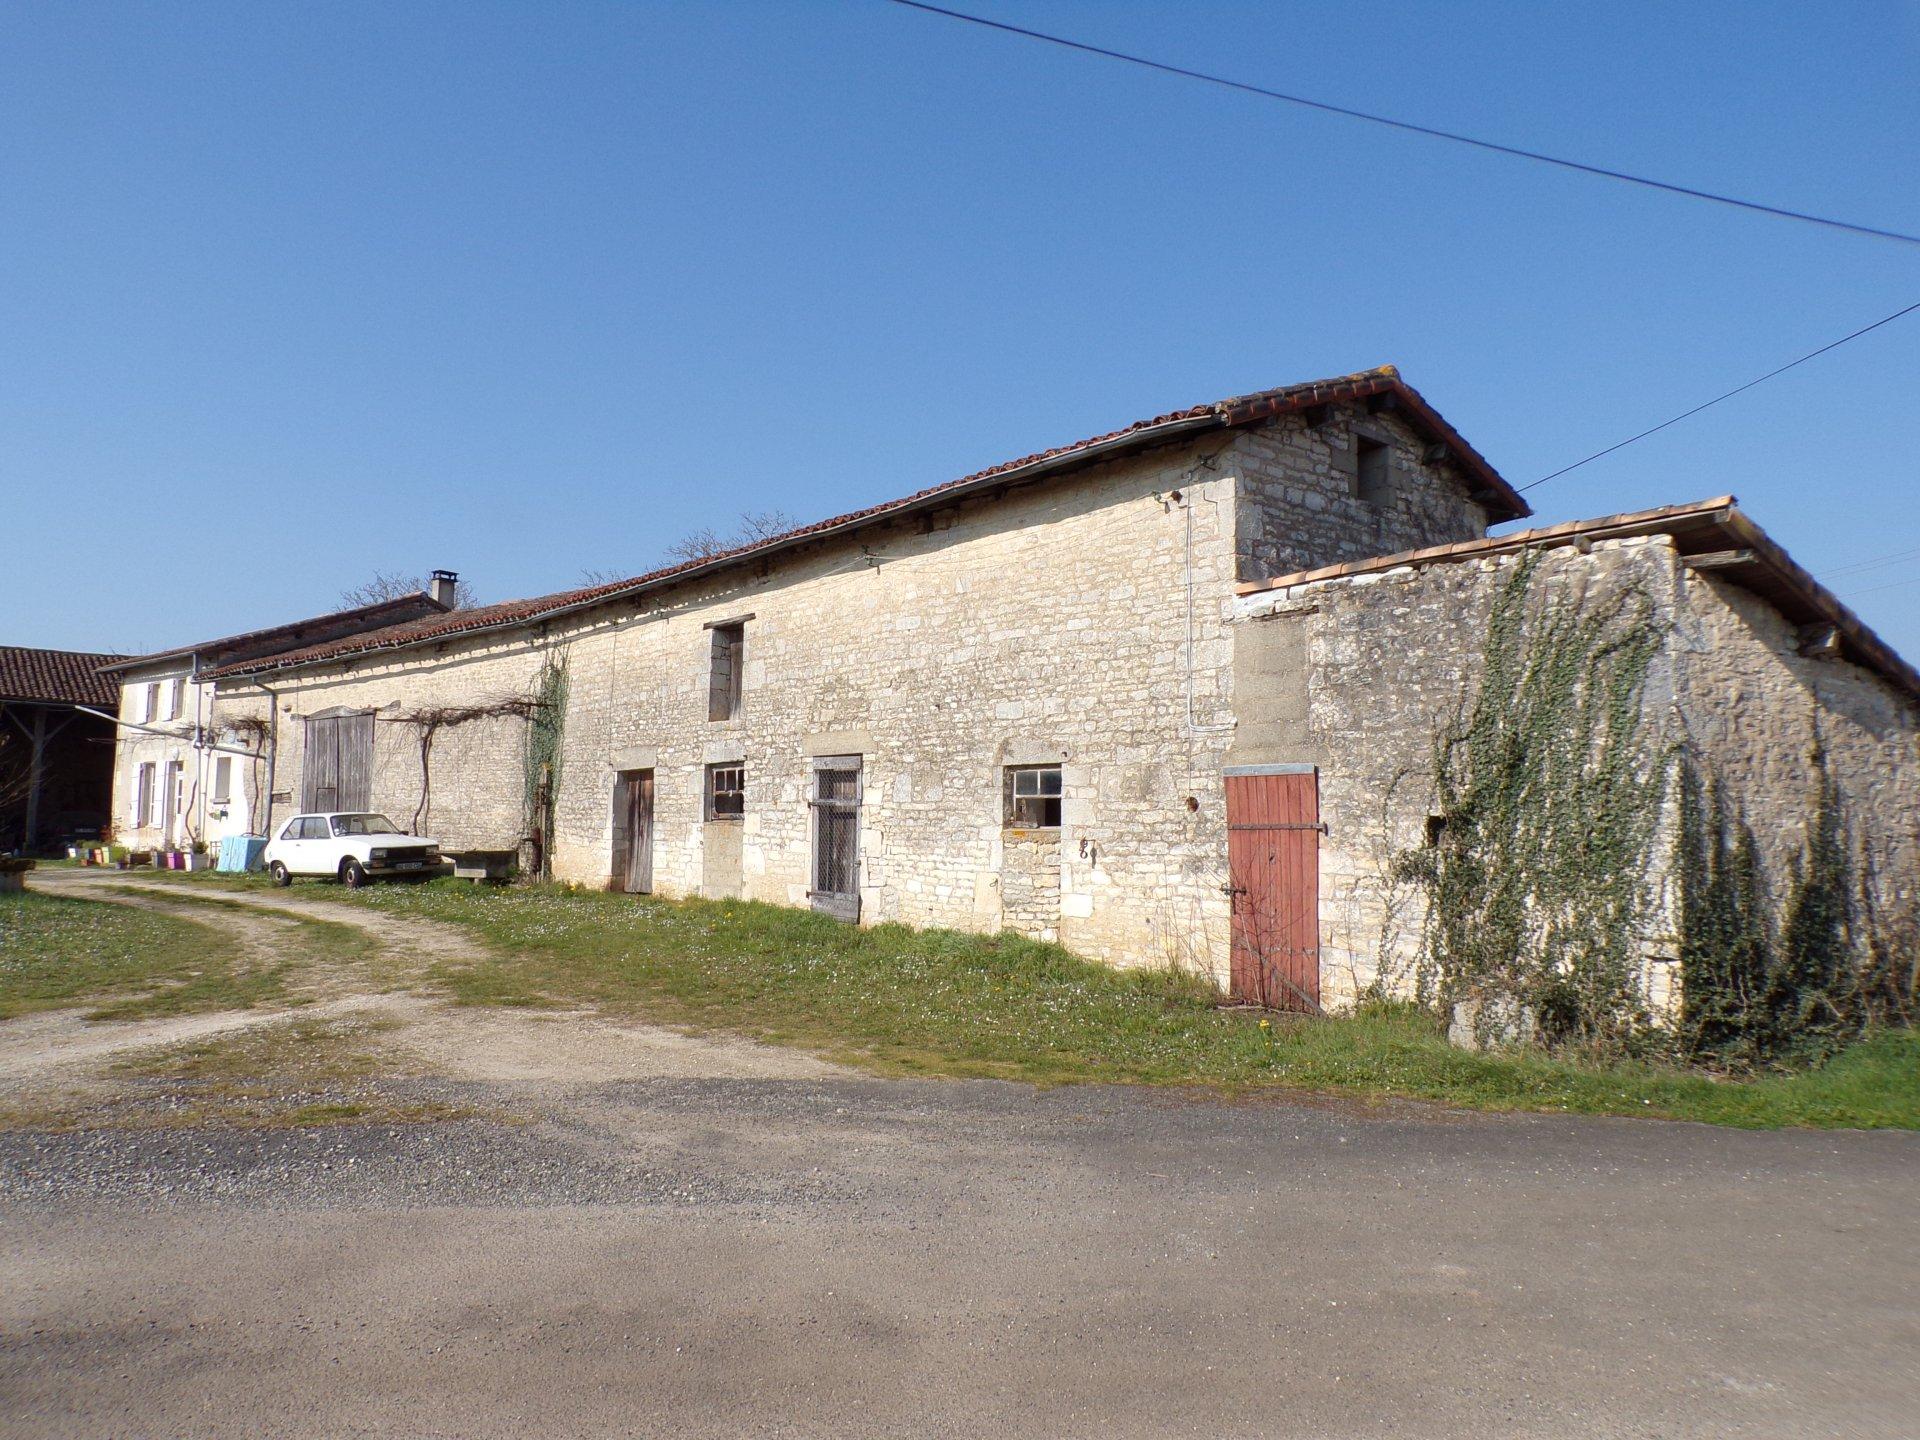 Maison de campagne proche de Ruffec